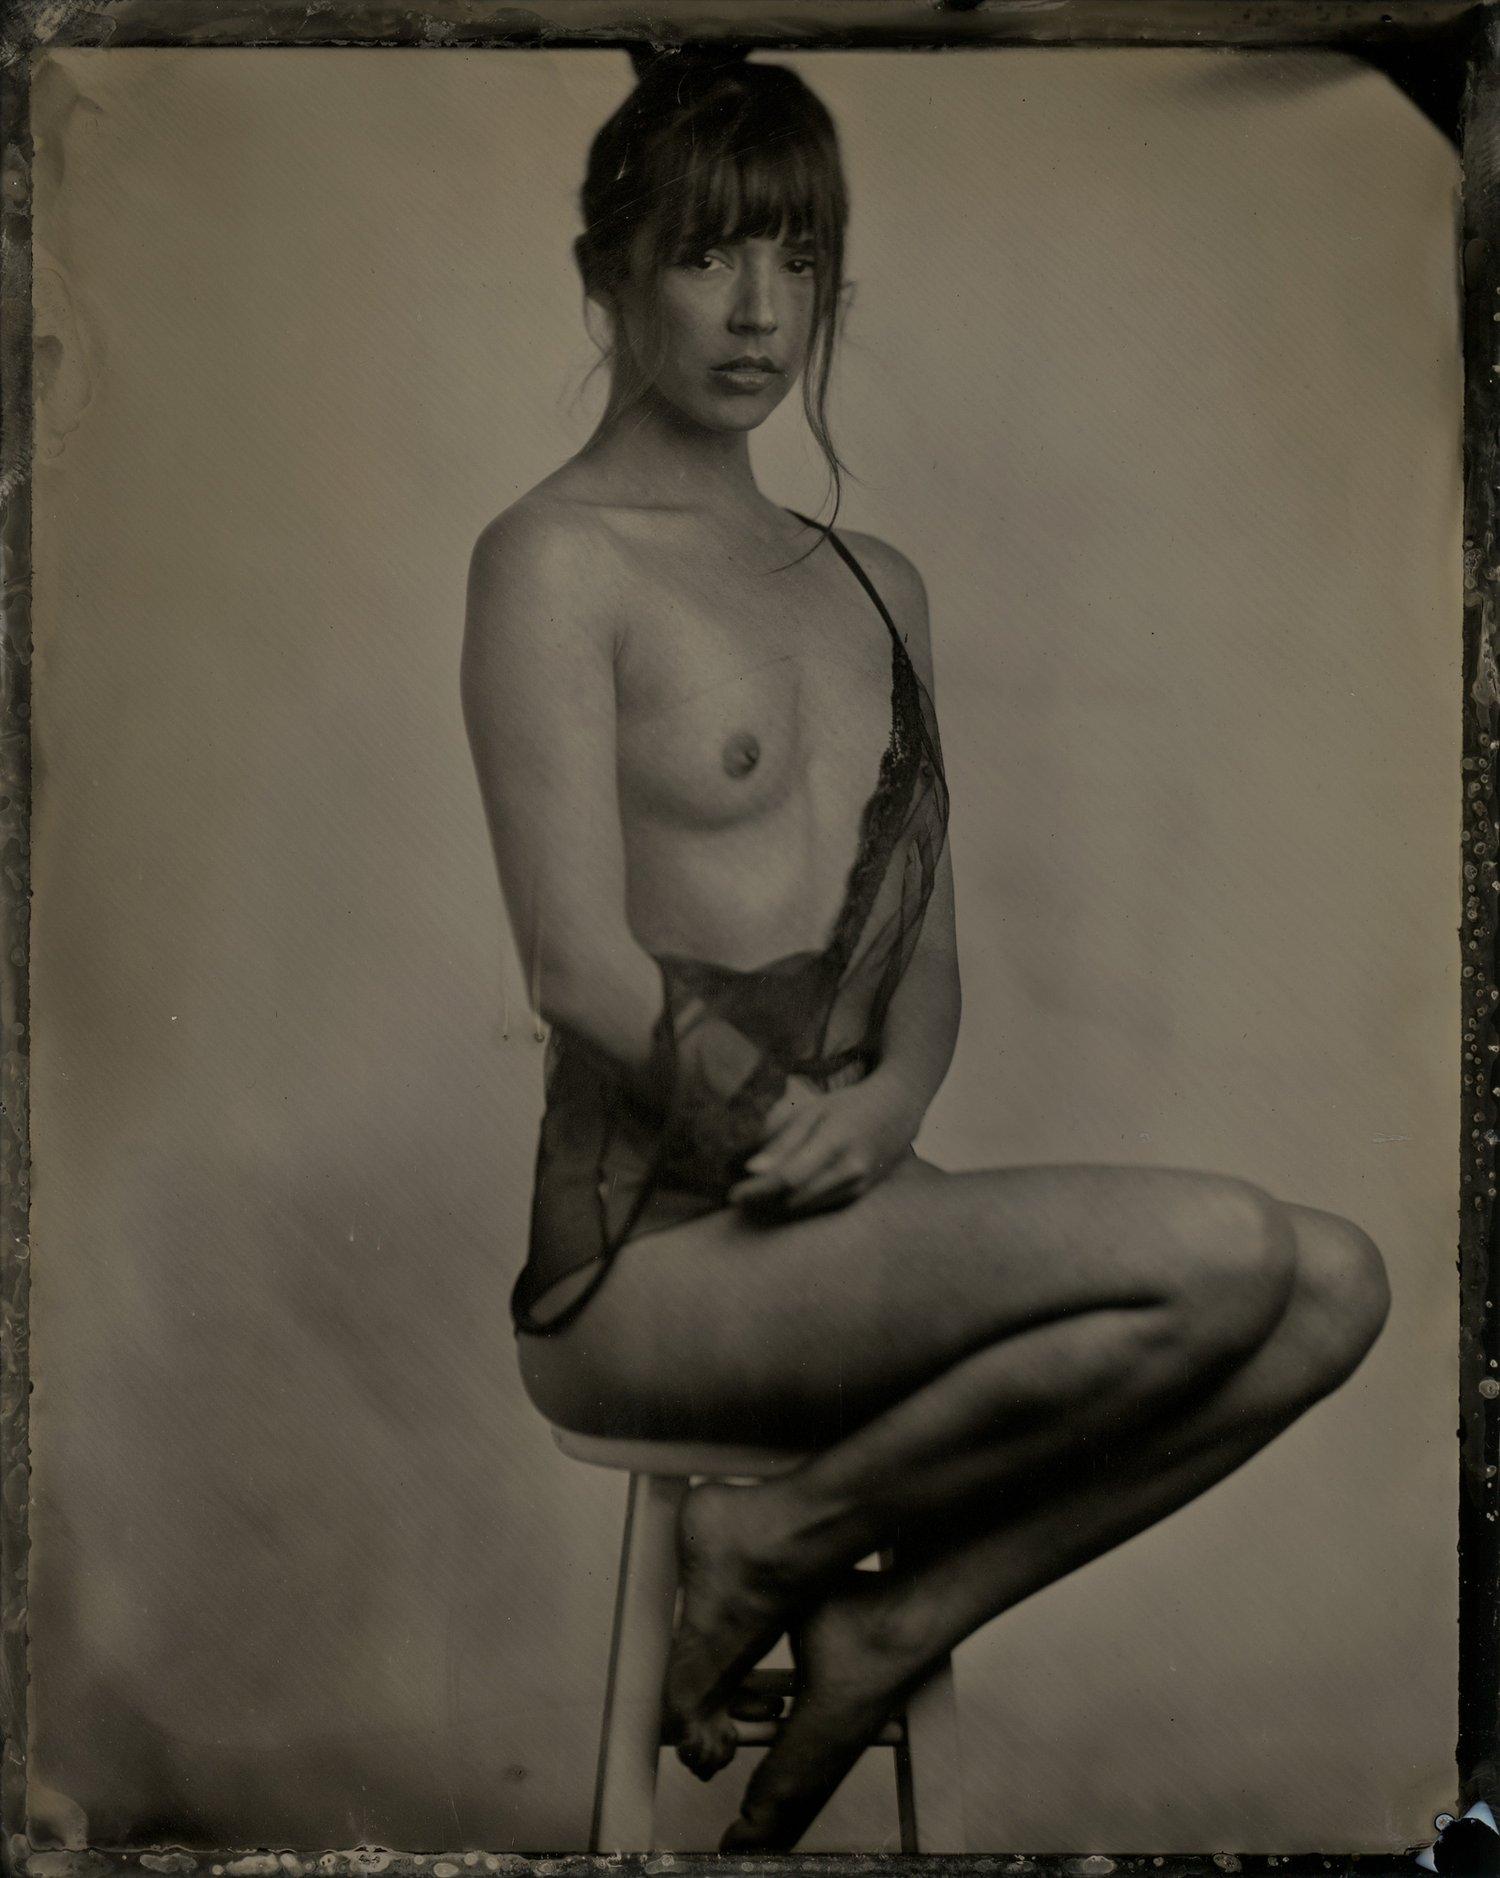 Image of Elizabeth. Tintype, 4x5